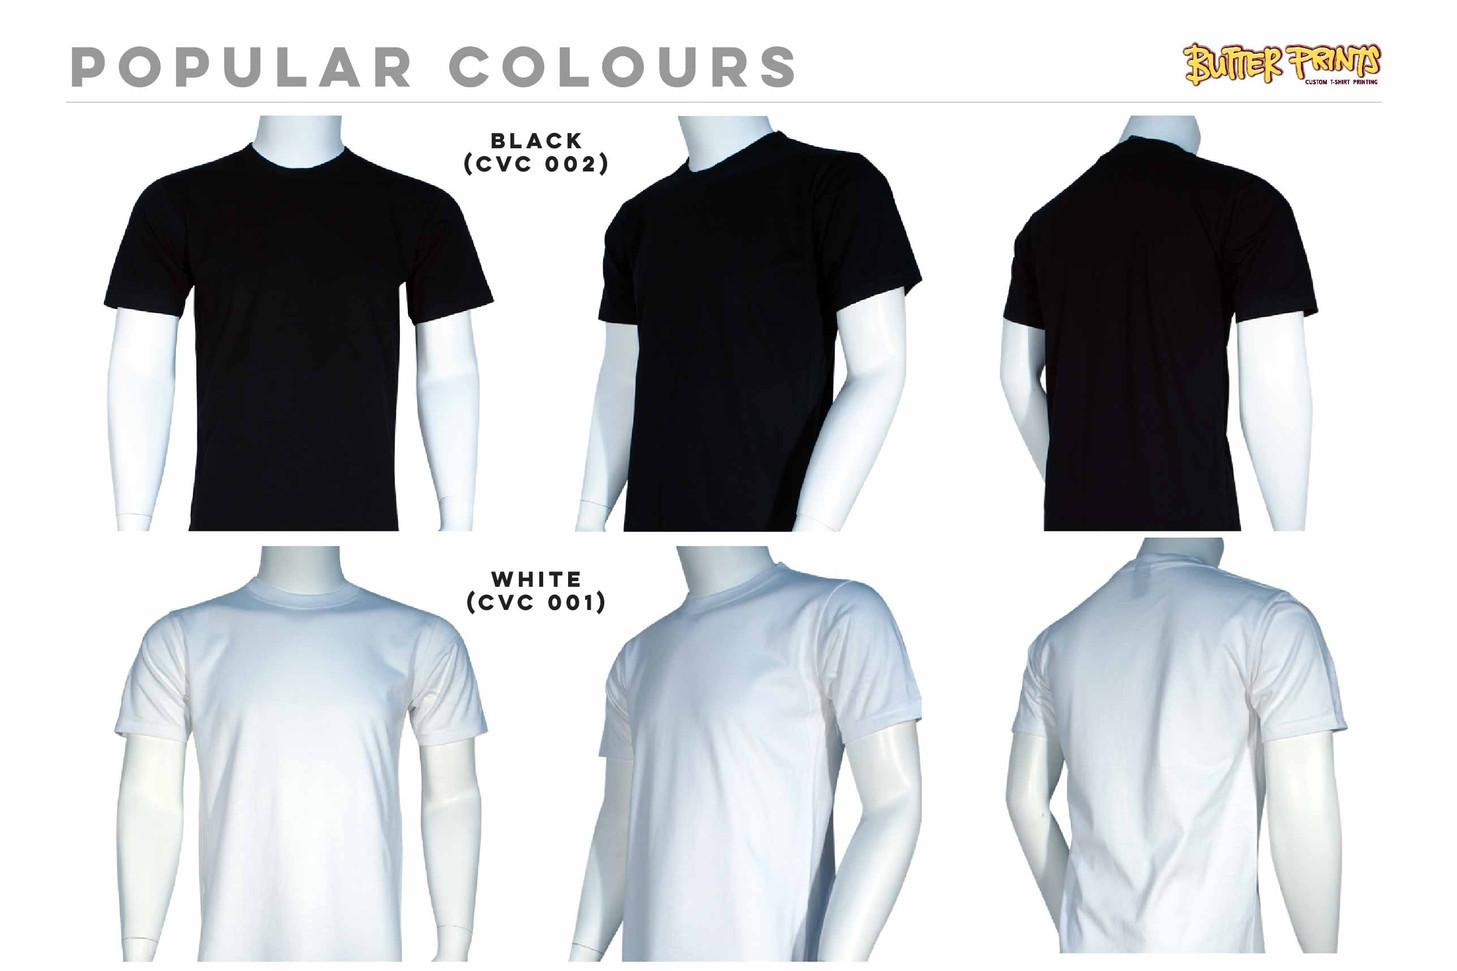 Black White Cotton Roundneck T-shirts